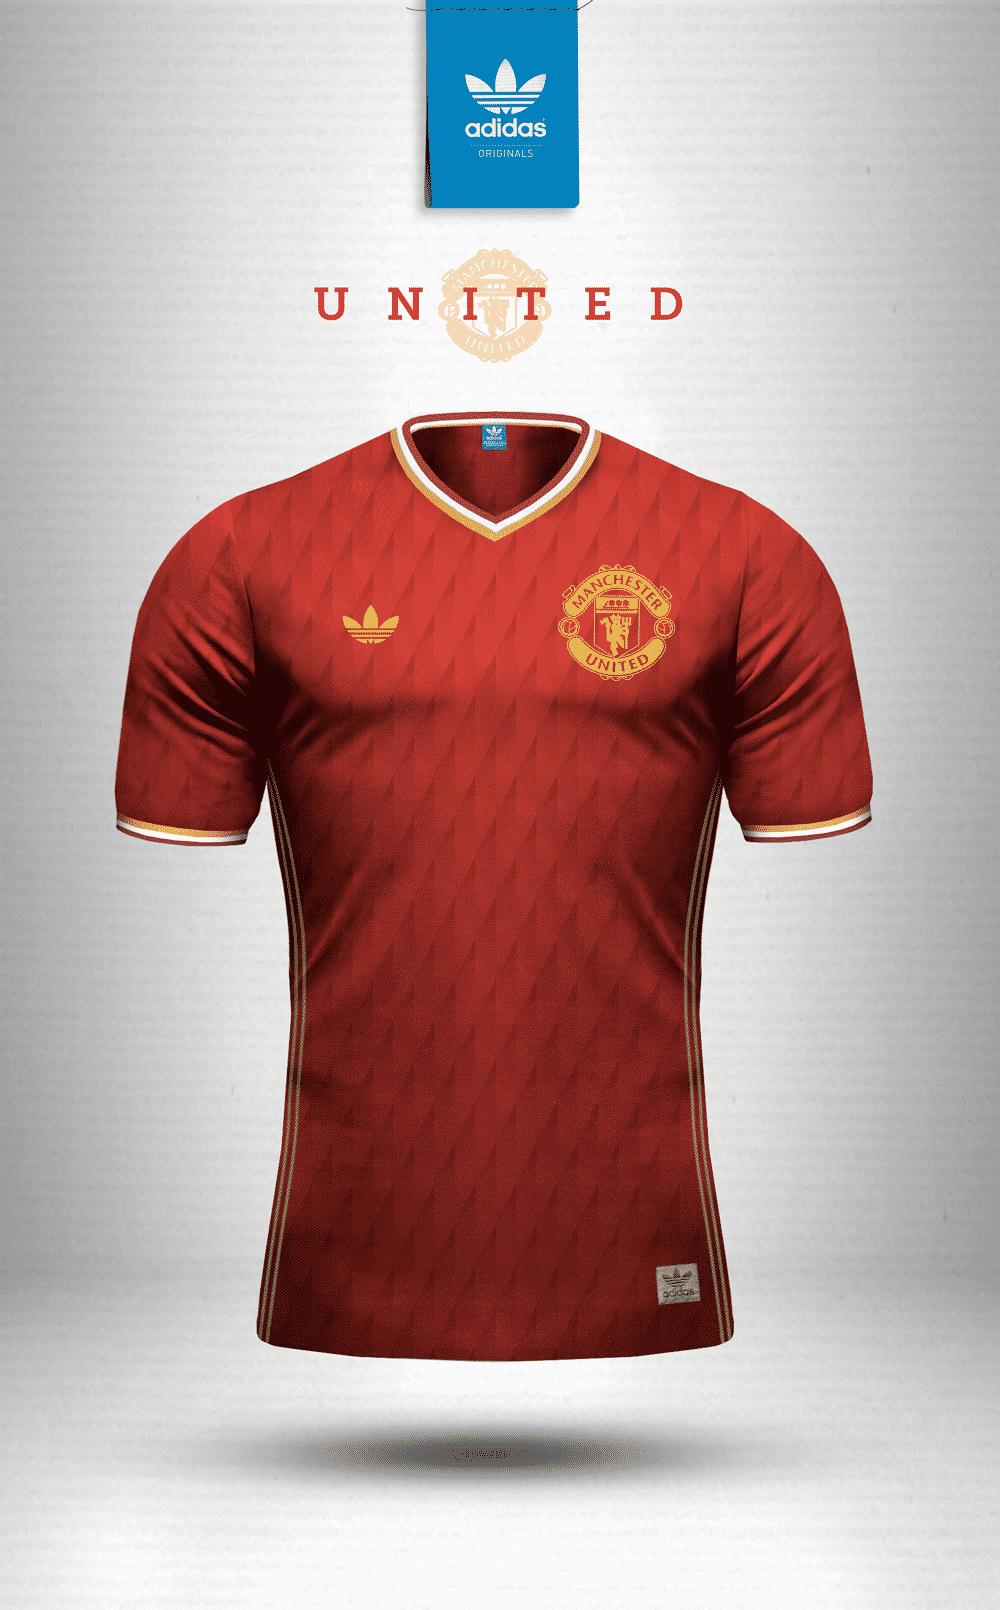 maillot-manchester-united-adidas-originals